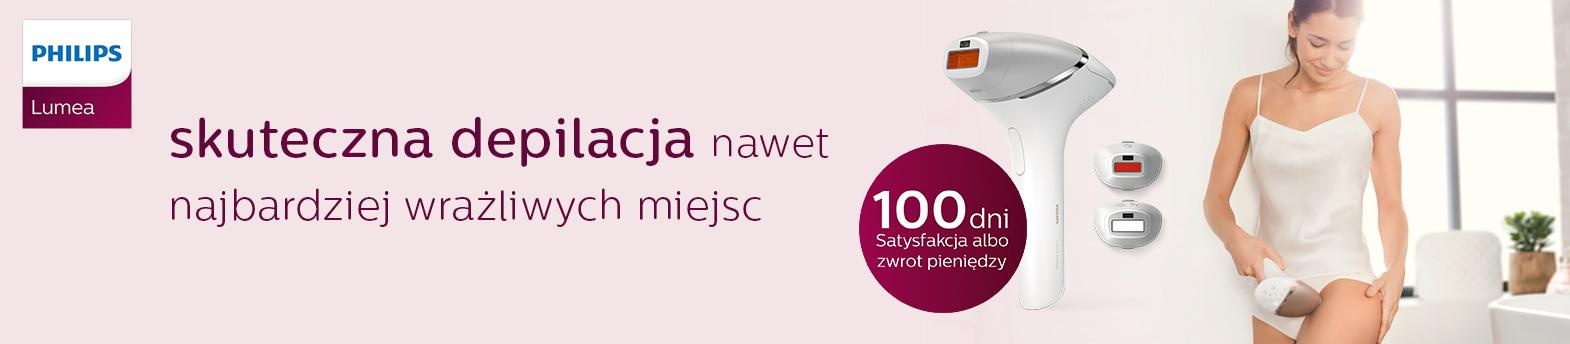 Philips Lumea - 100 dni na zwrot